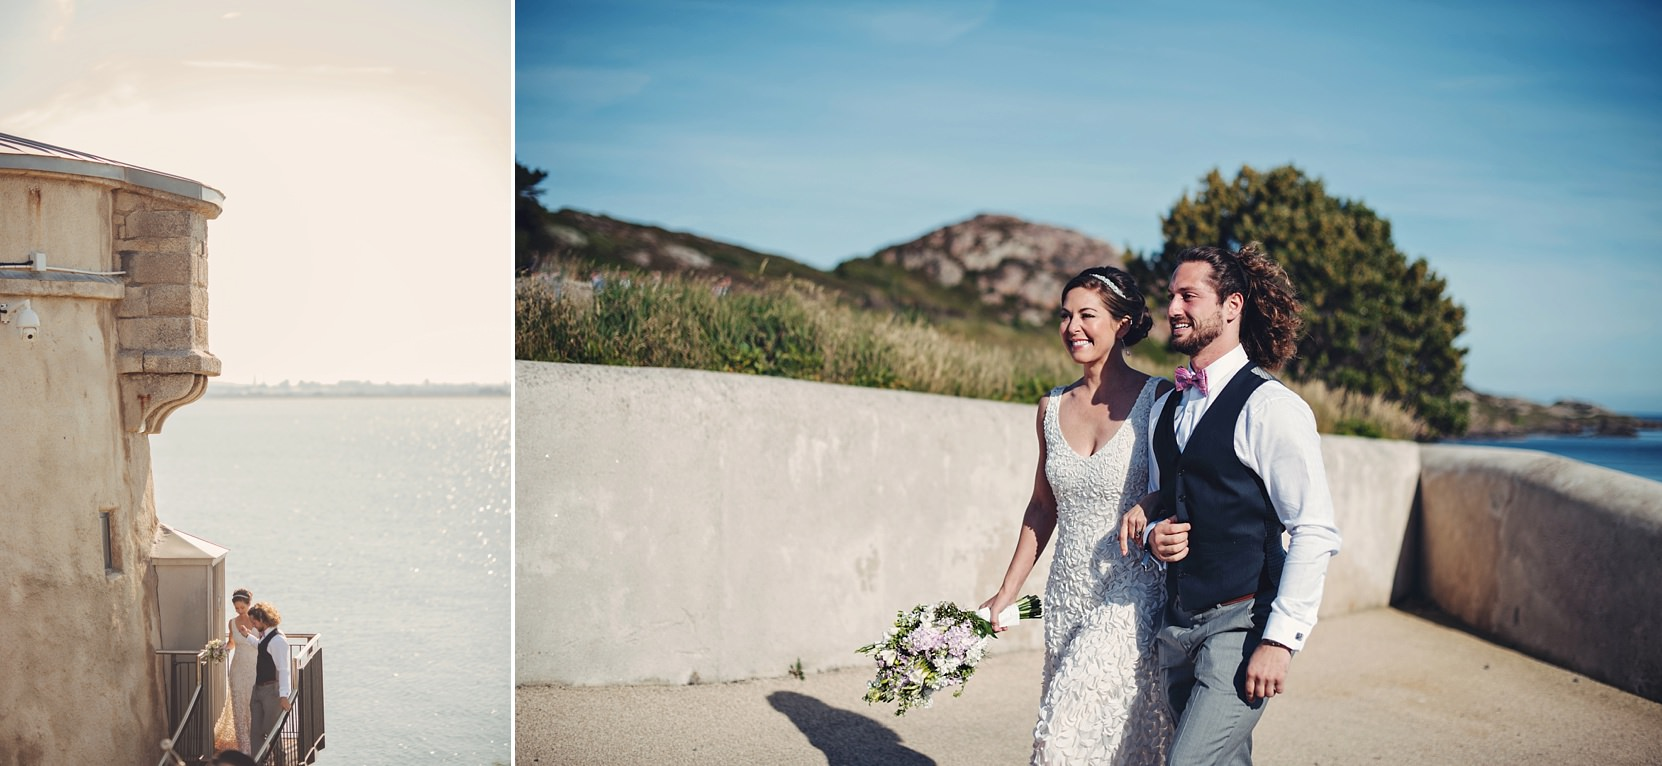 Irish-Destination-Wedding-Photographer_0089